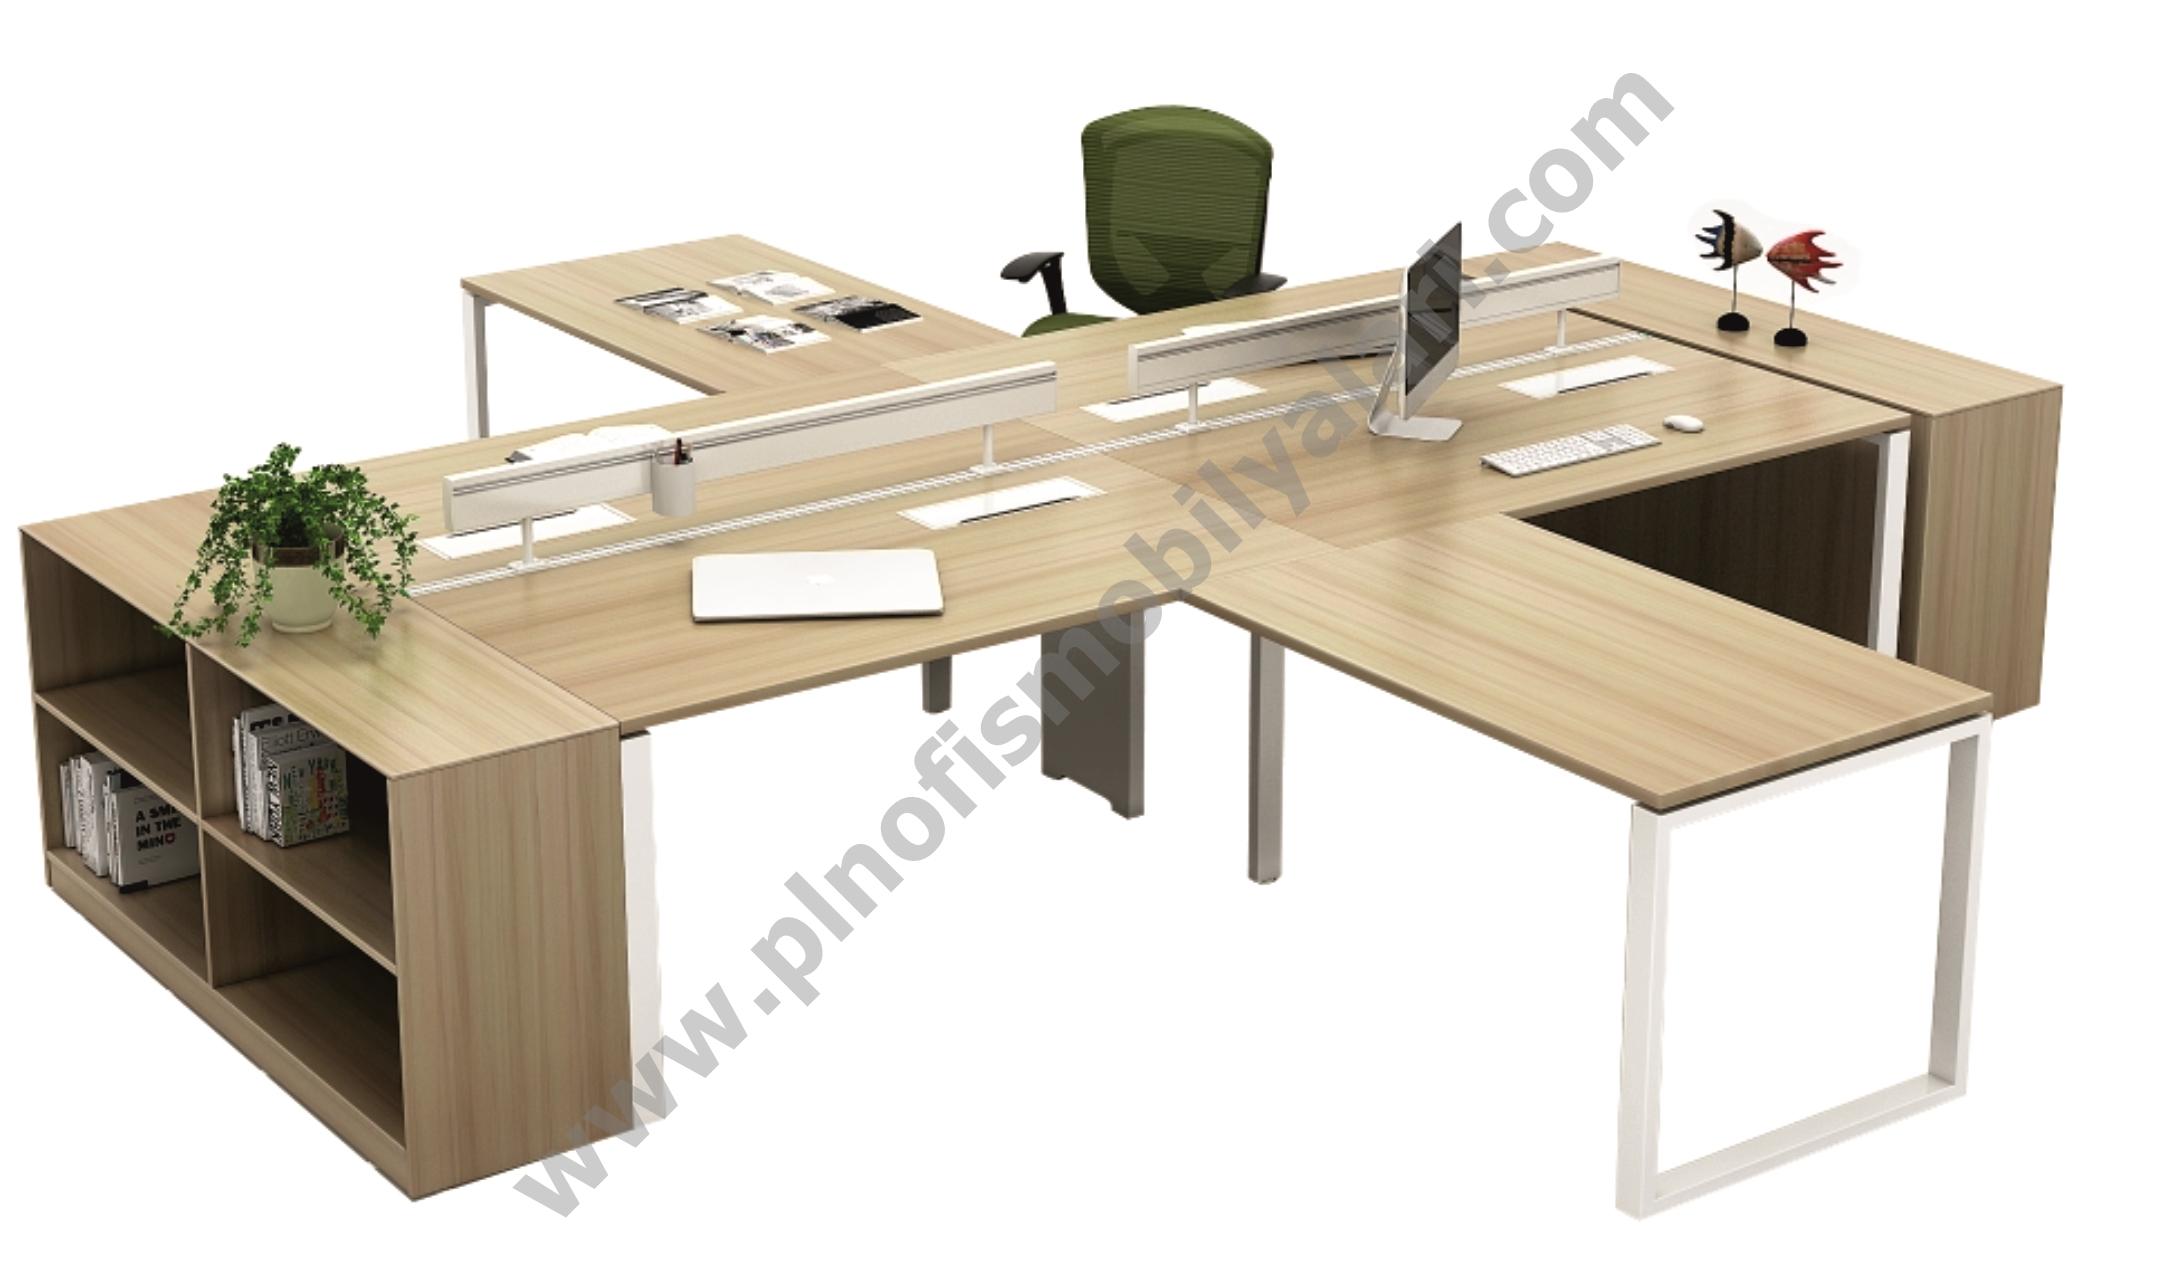 Neto Çoklu Çalışma Masası - PLN-3300